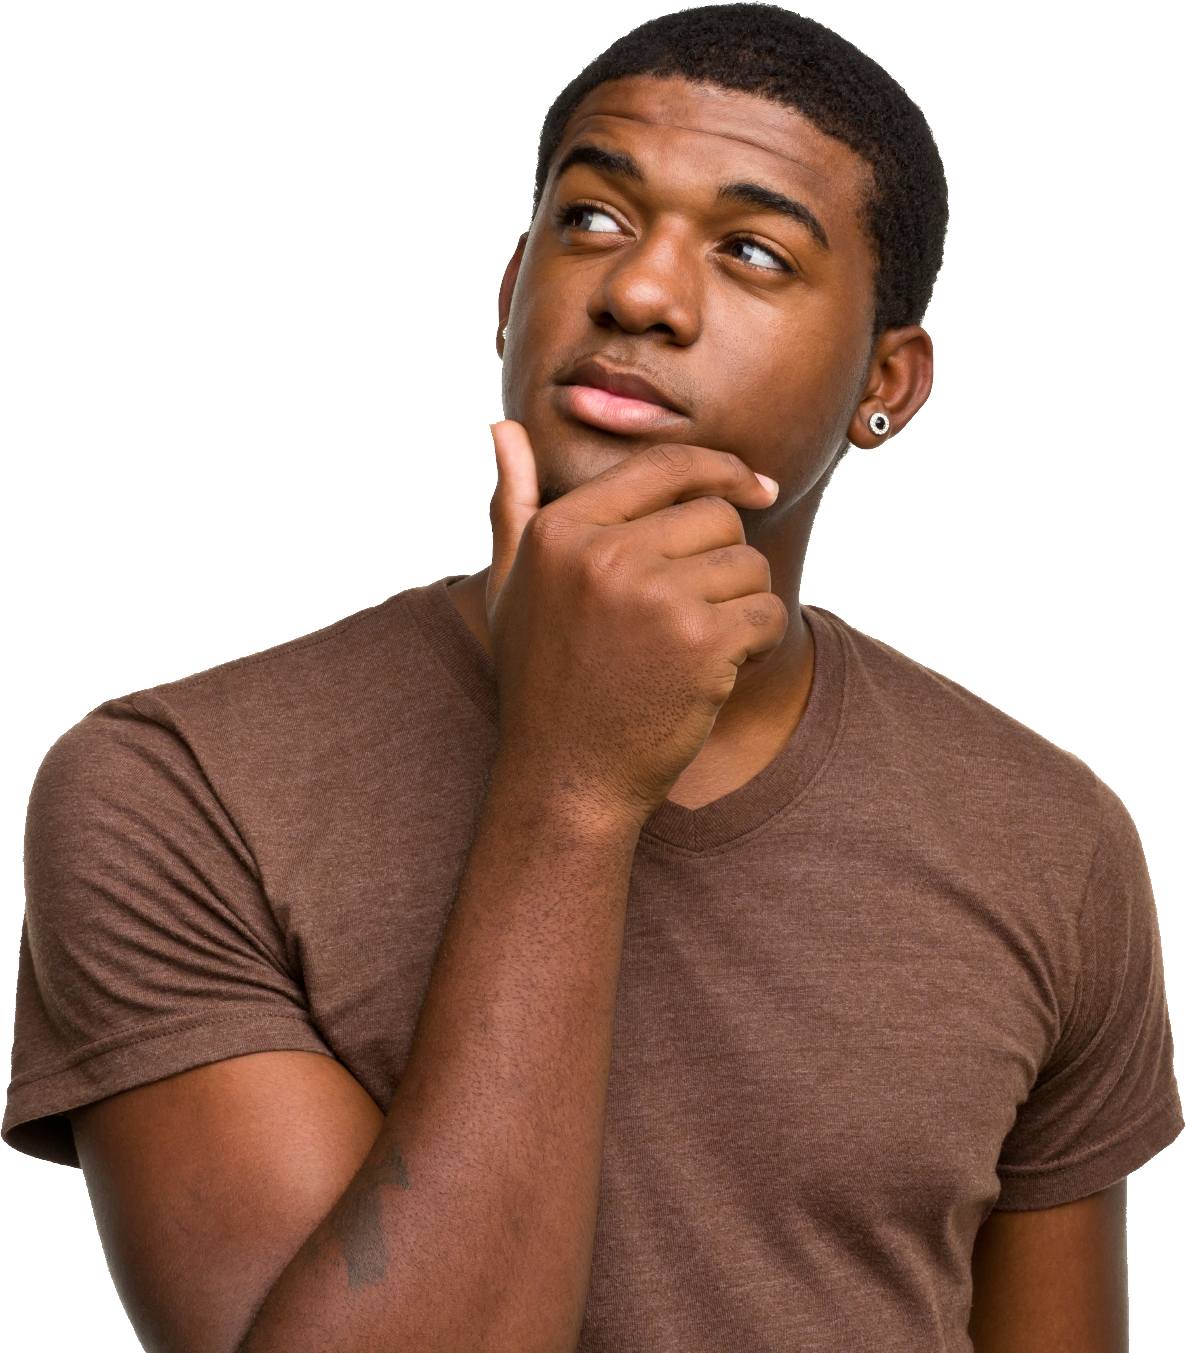 Thinking Man PNG Image